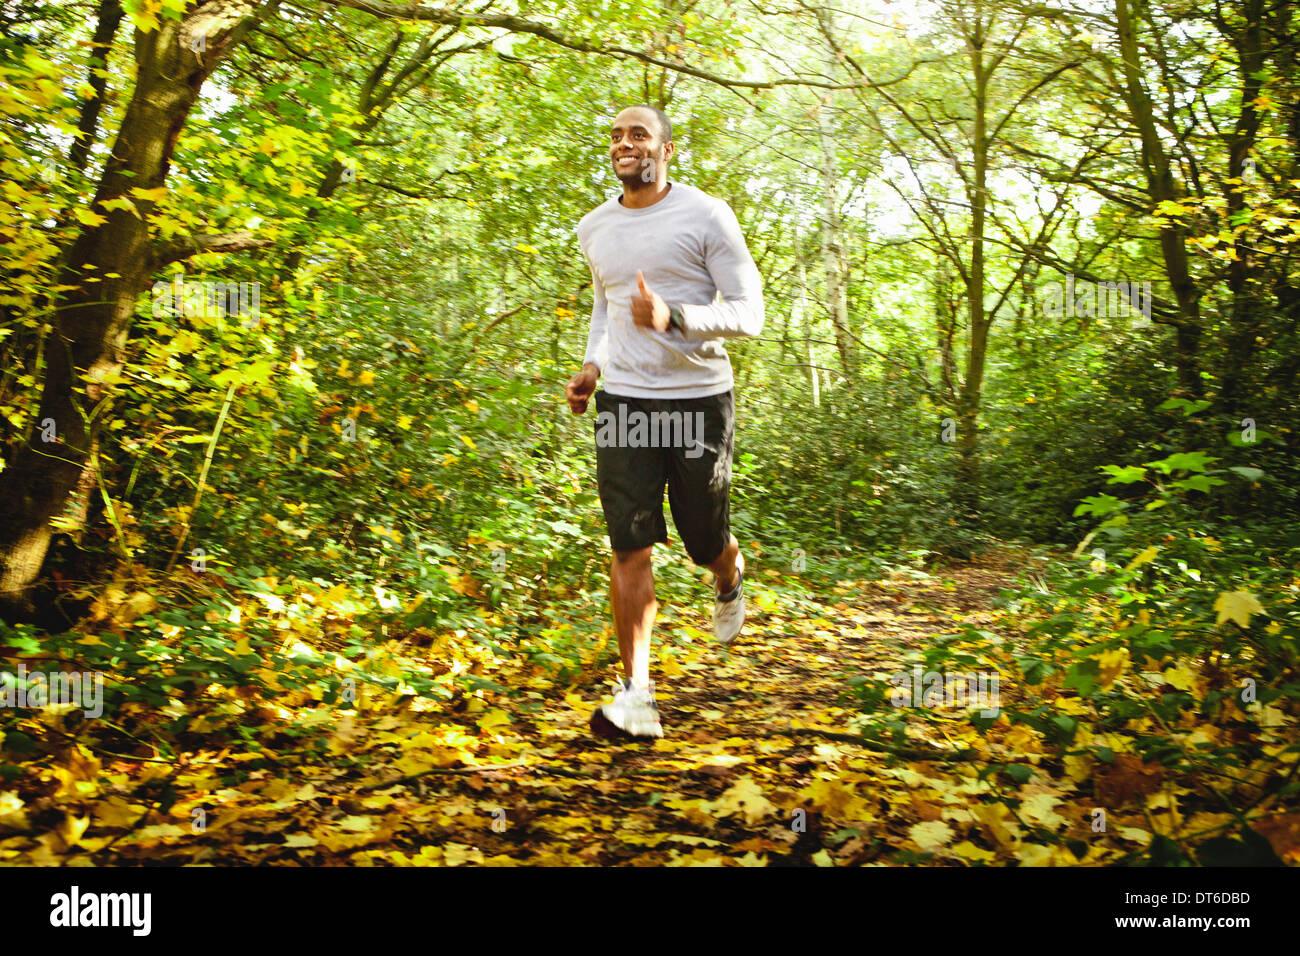 Mann im Wald joggen Stockbild